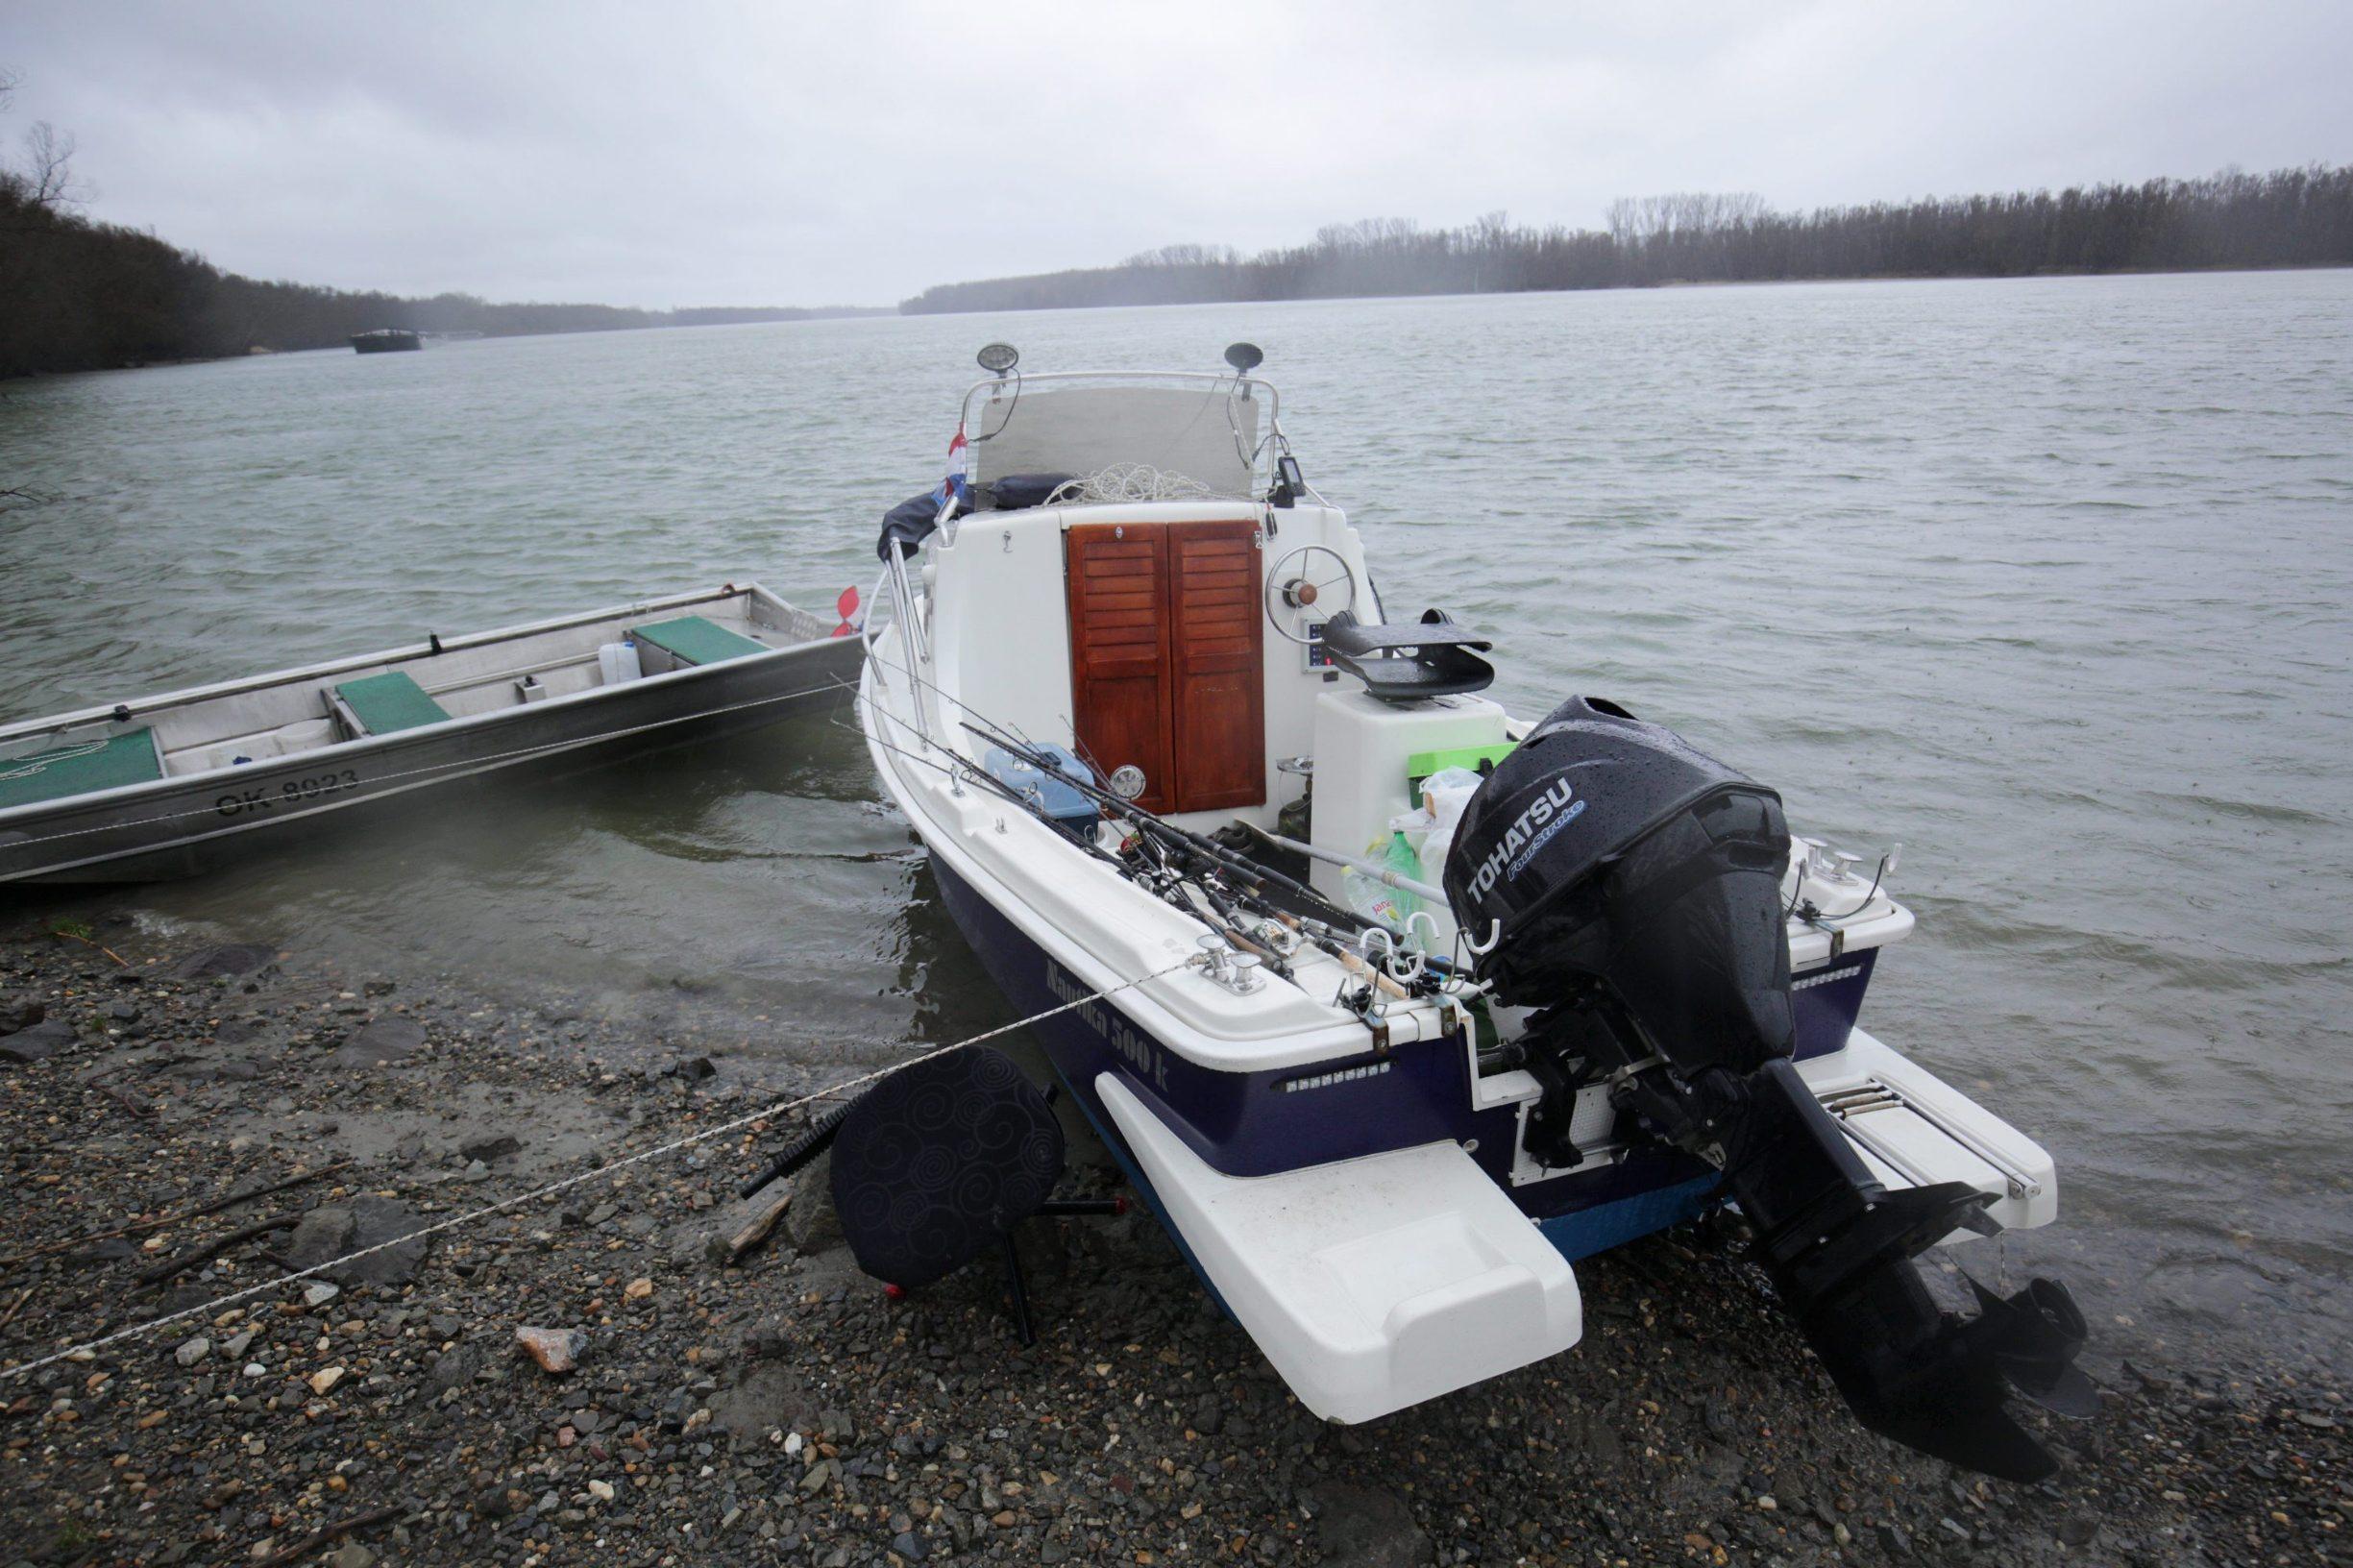 Čamac poginulih ribiča